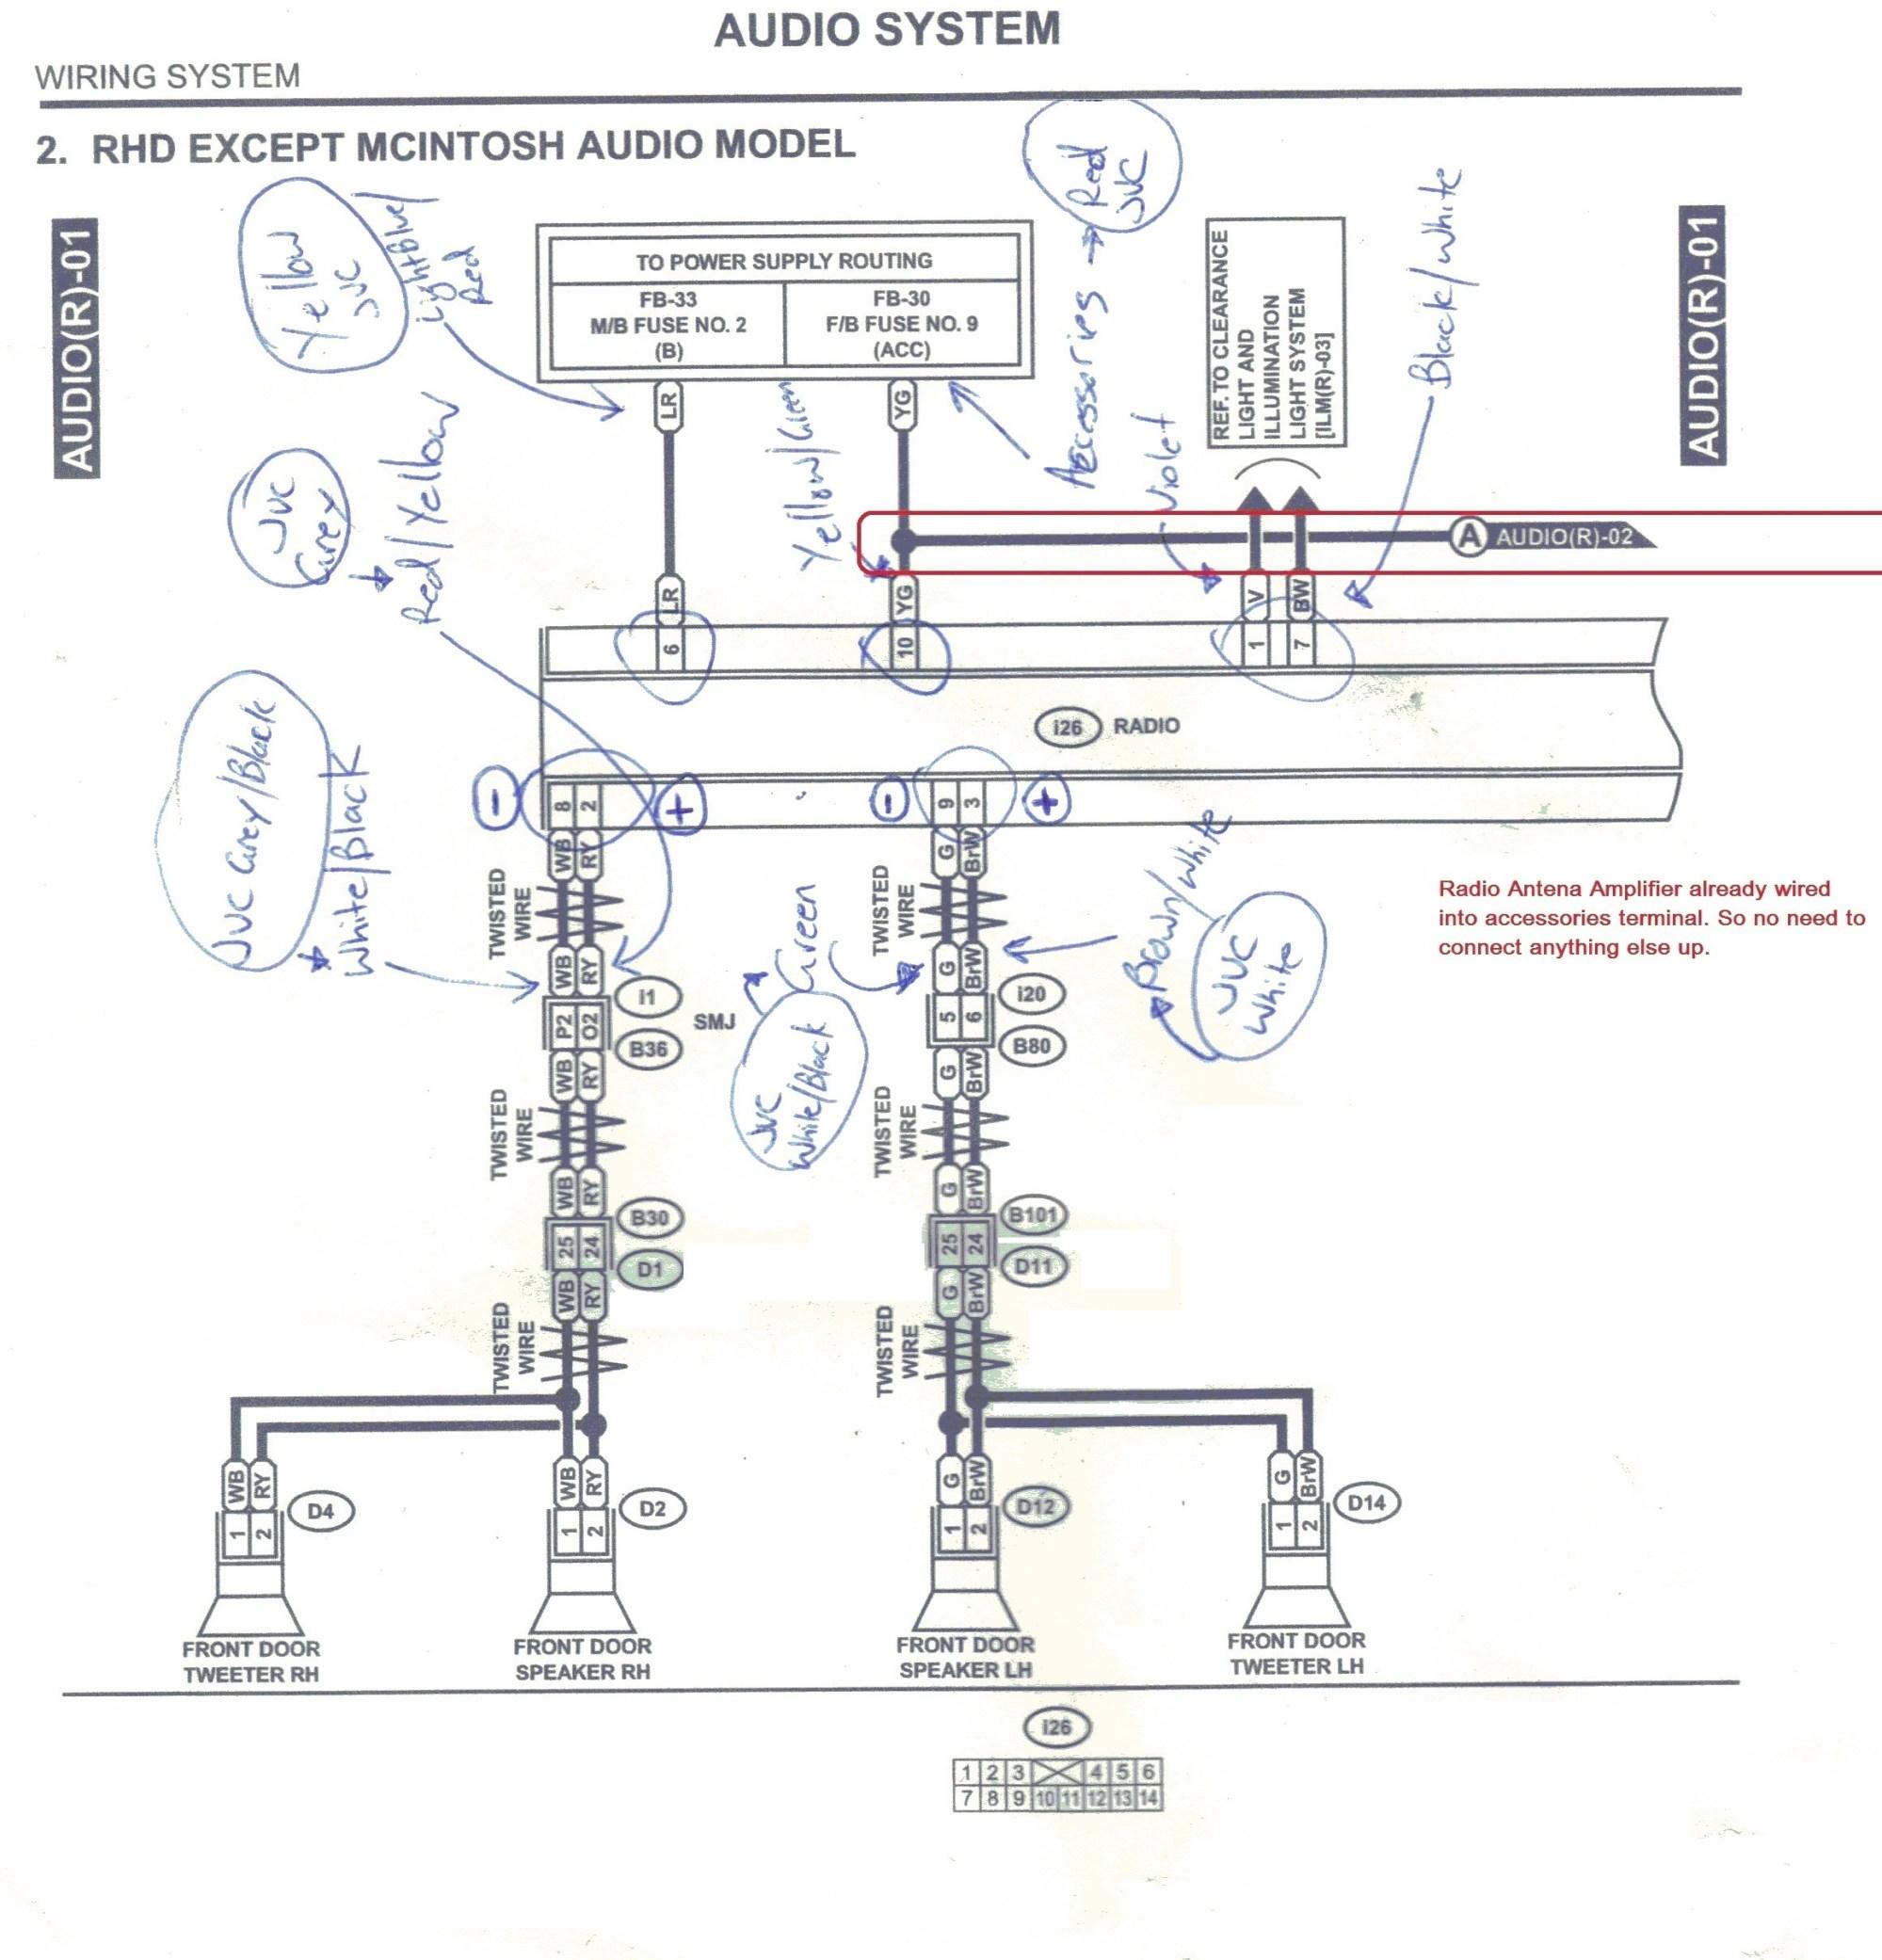 hight resolution of radio schematic 01 jpg